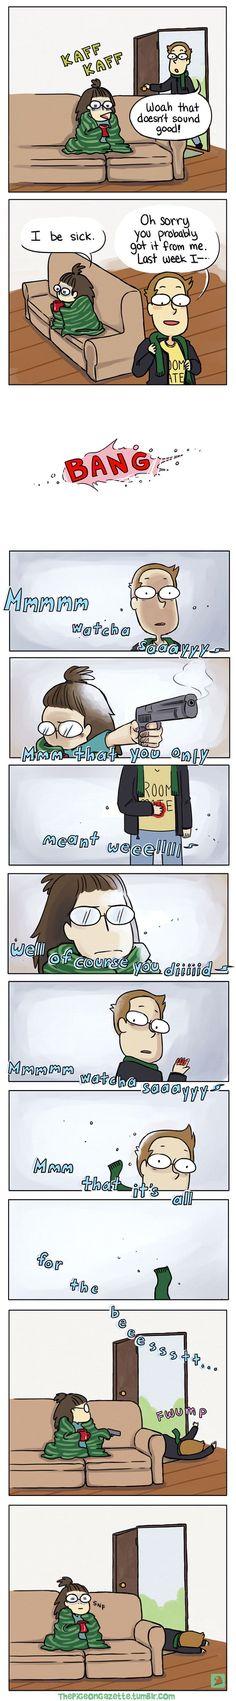 10+ Hilarious Comics For Socially Awkward People #FunnyThings